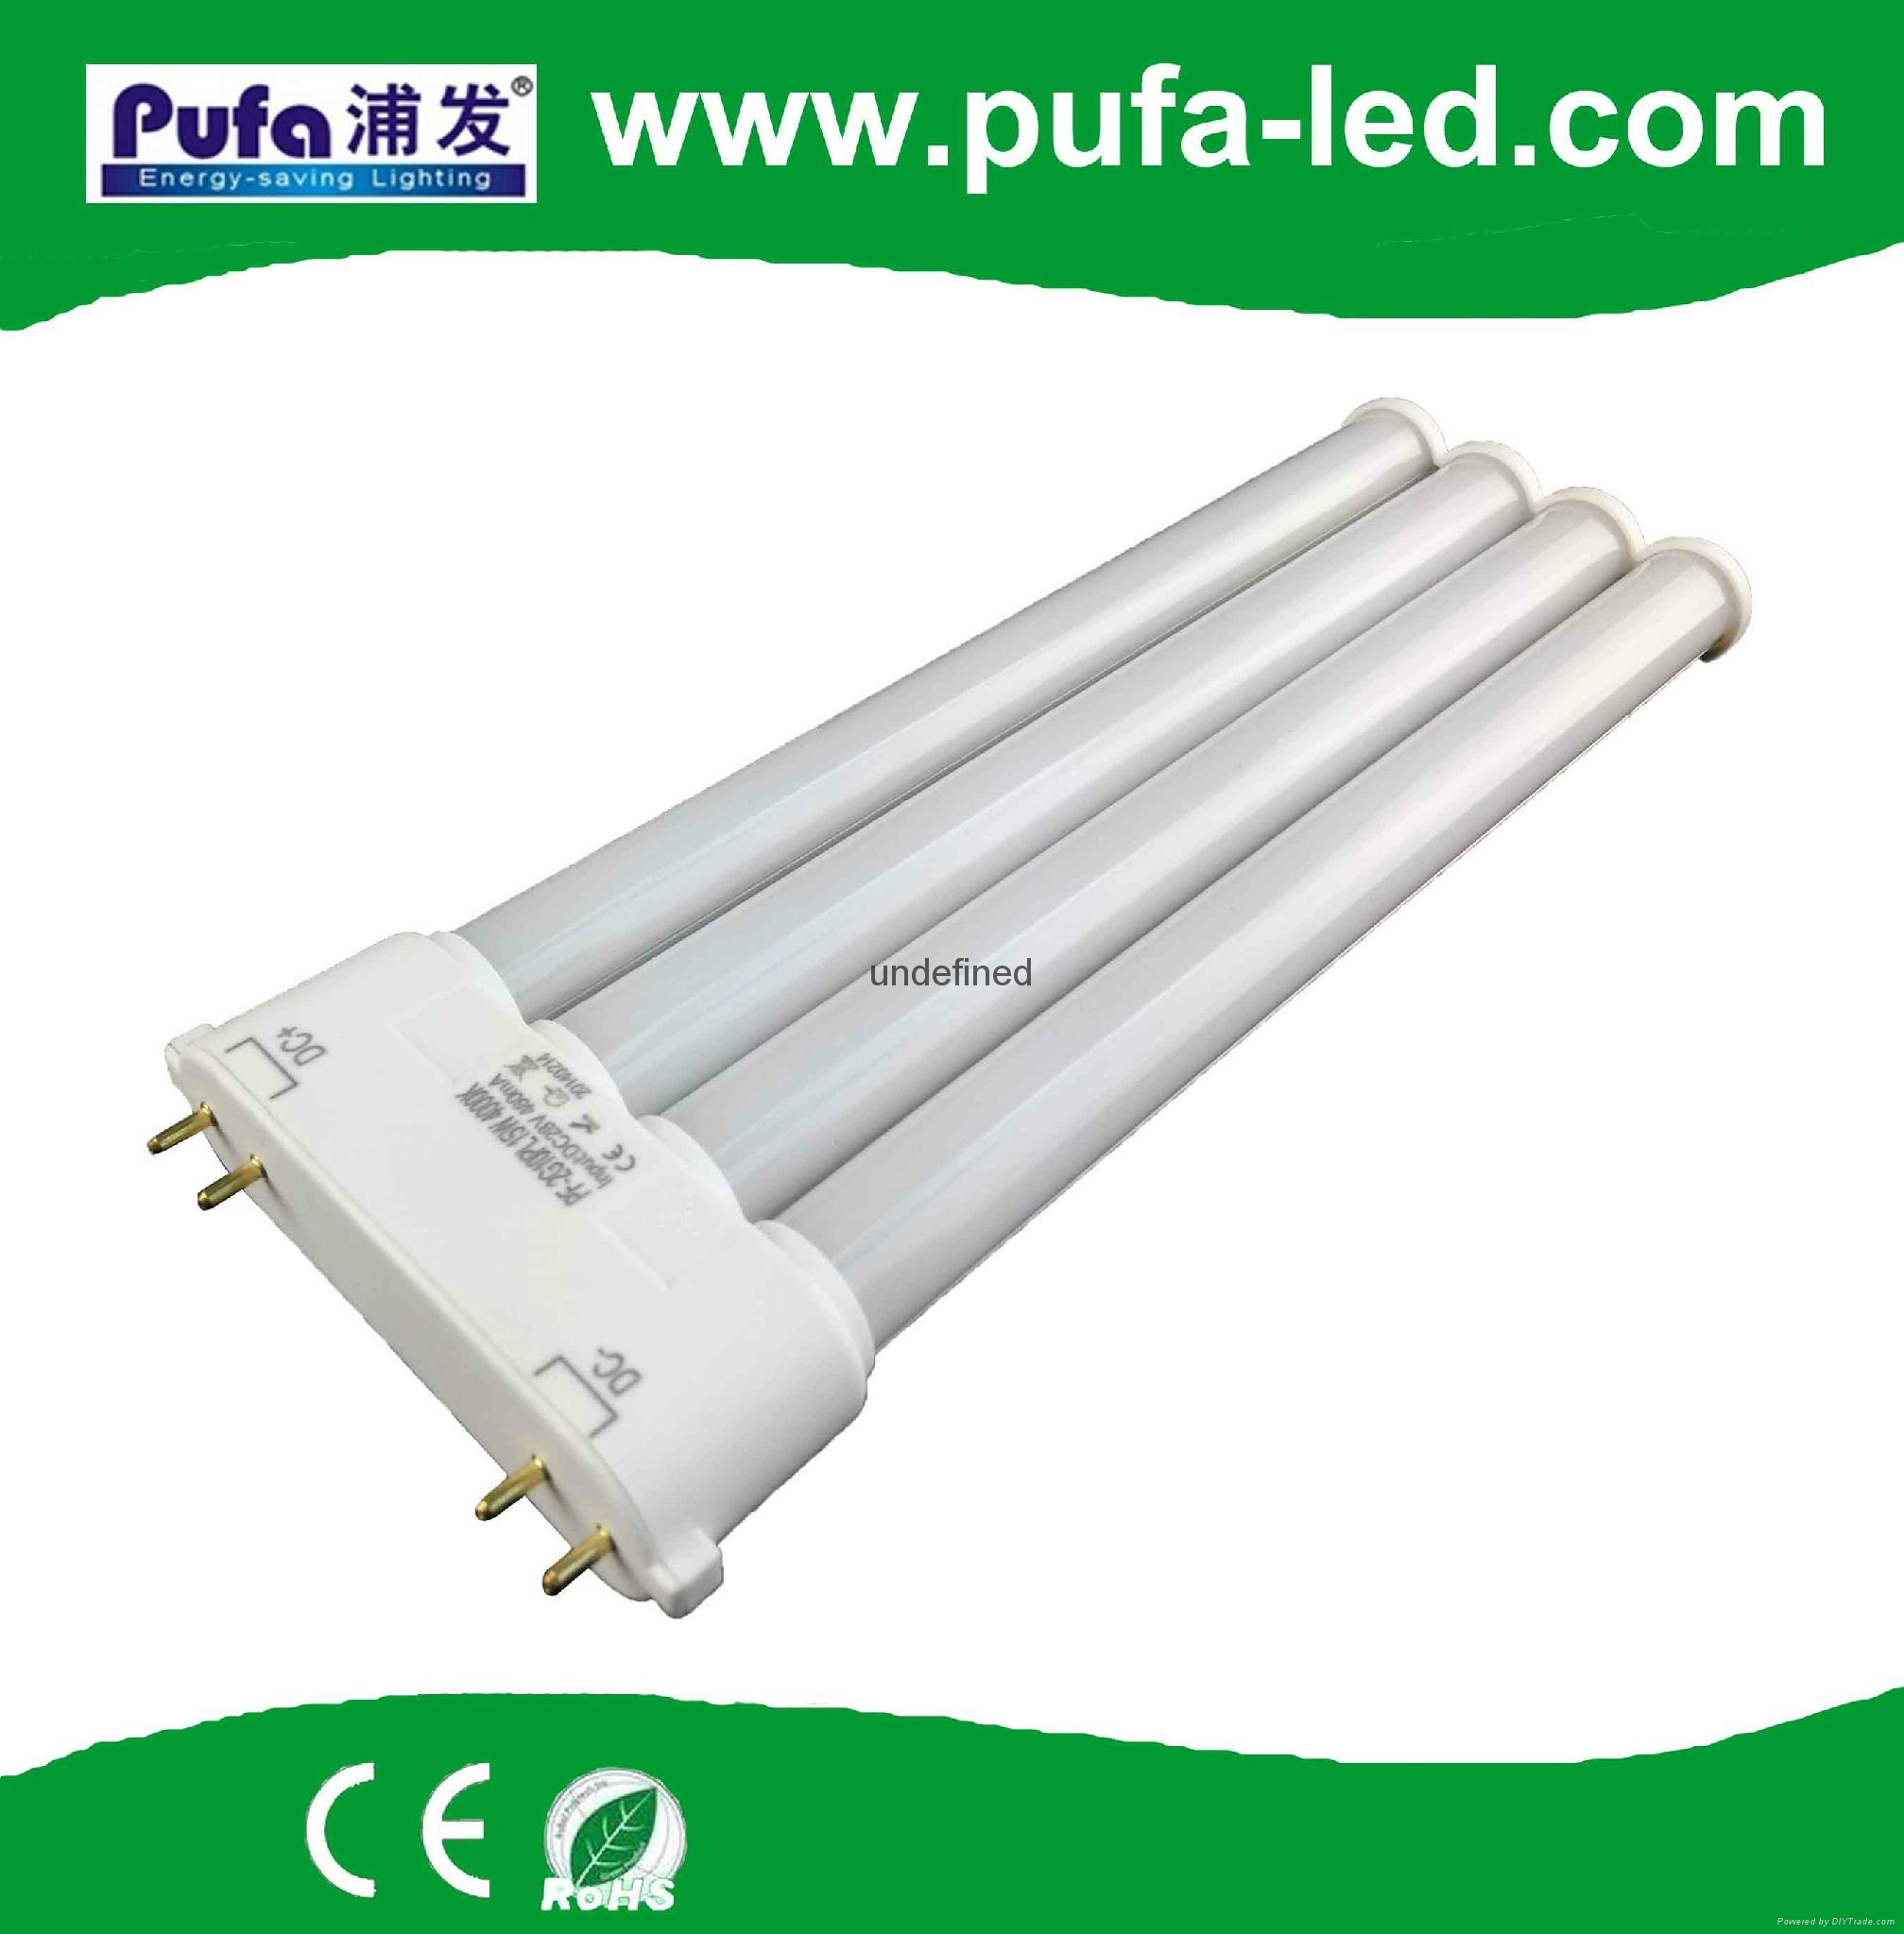 2G10 LED橫插燈管 9W 1